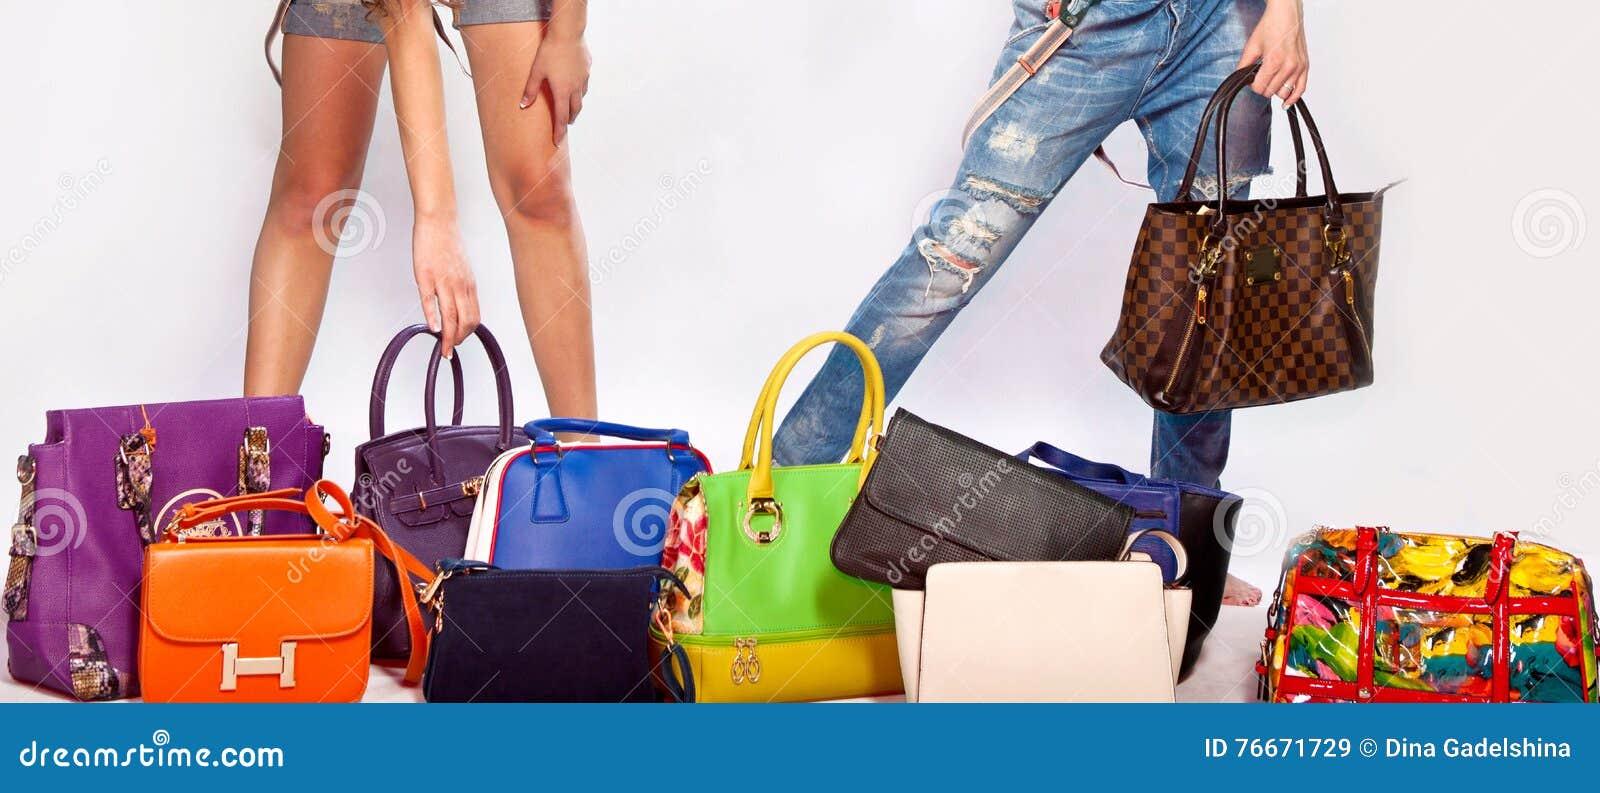 0870b2e8ff Πολύ women  x27 τσάντα δέρματος μόδας του s σε ένα άσπρο υπόβαθρο Women   x27 λεπτά πόδια του s